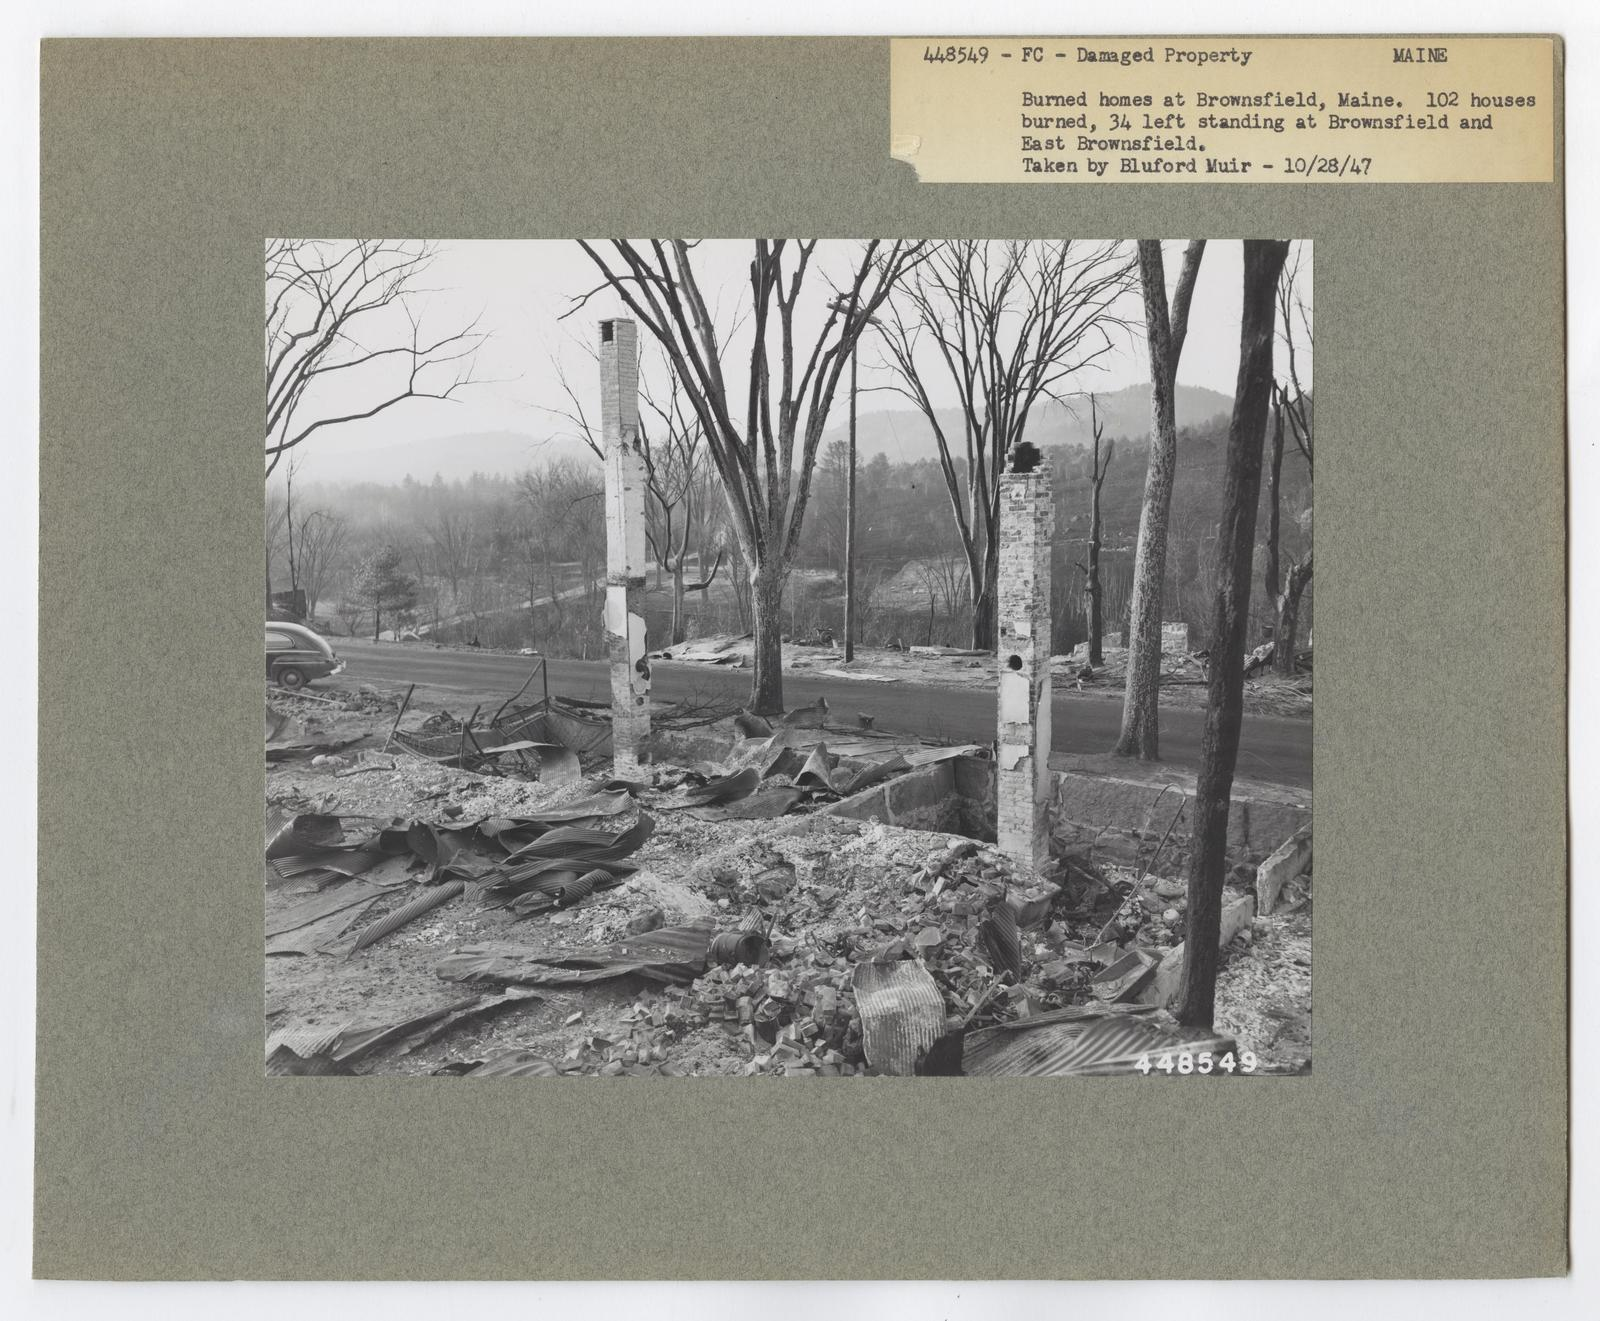 Damaged Properties - Maine